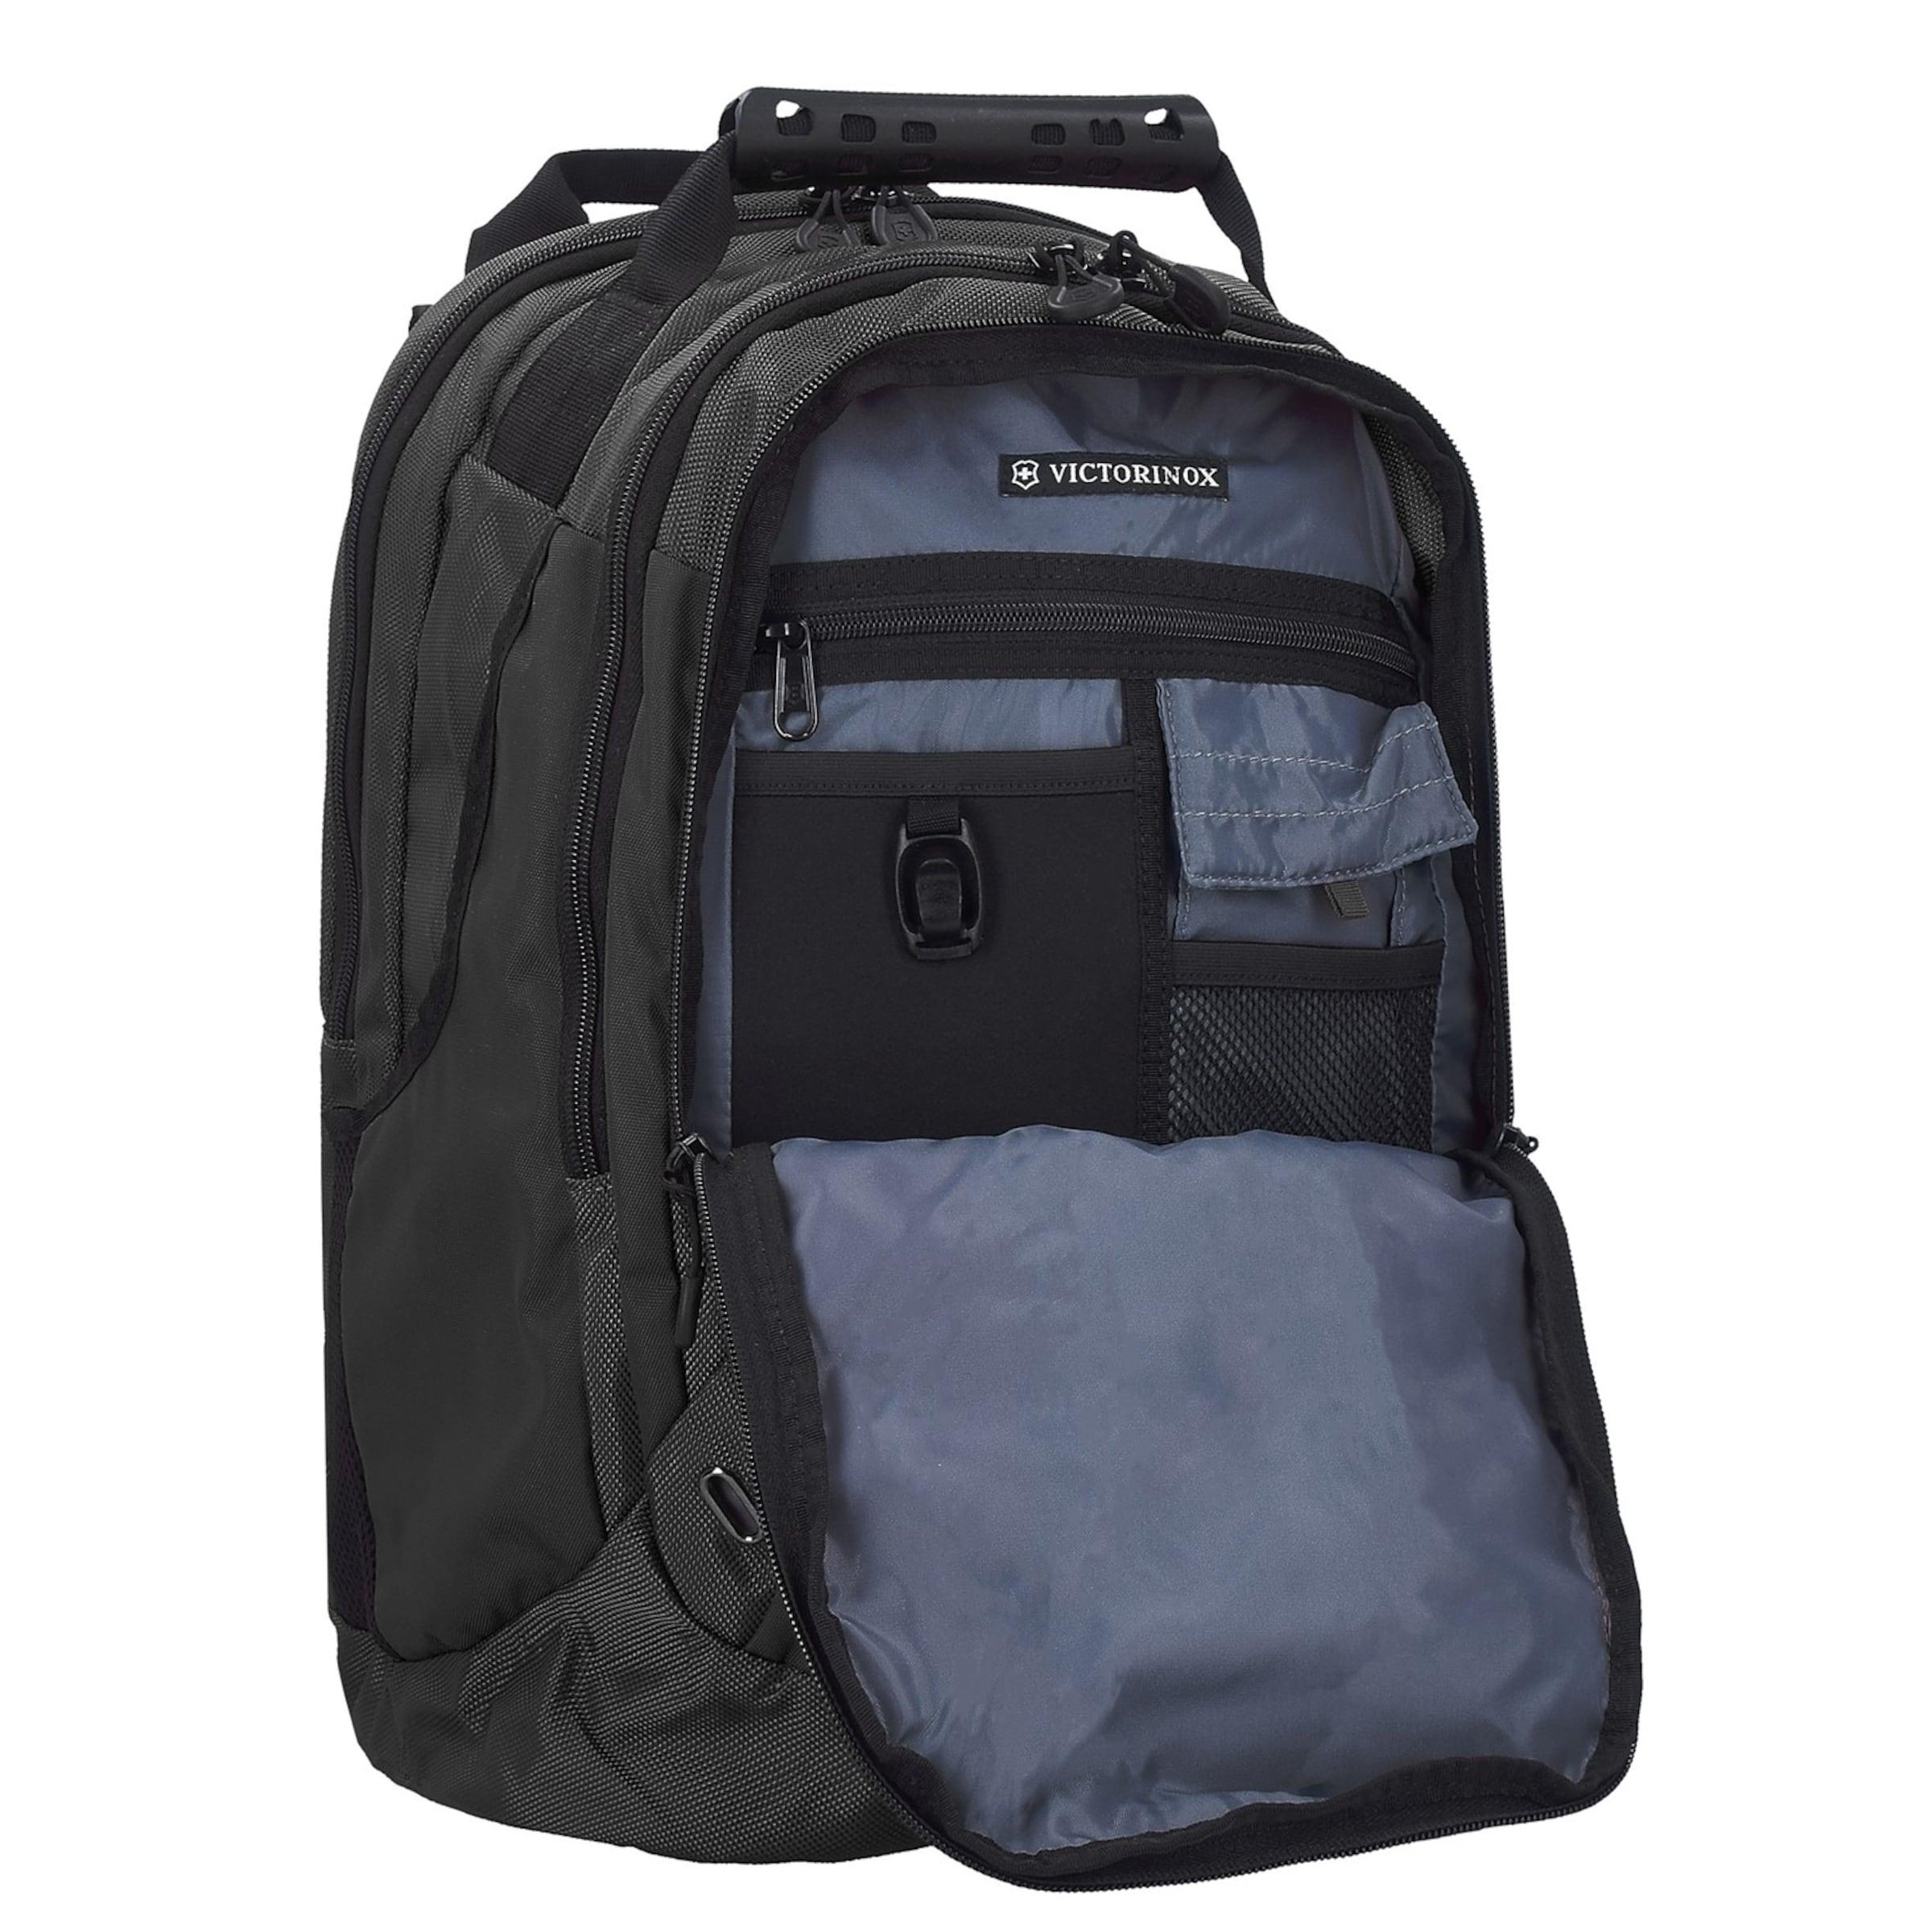 Victorinox En Bleu 'vx Sac Sport Portable D'ordinateur Trooper' FoncéNoir f7bgY6yv